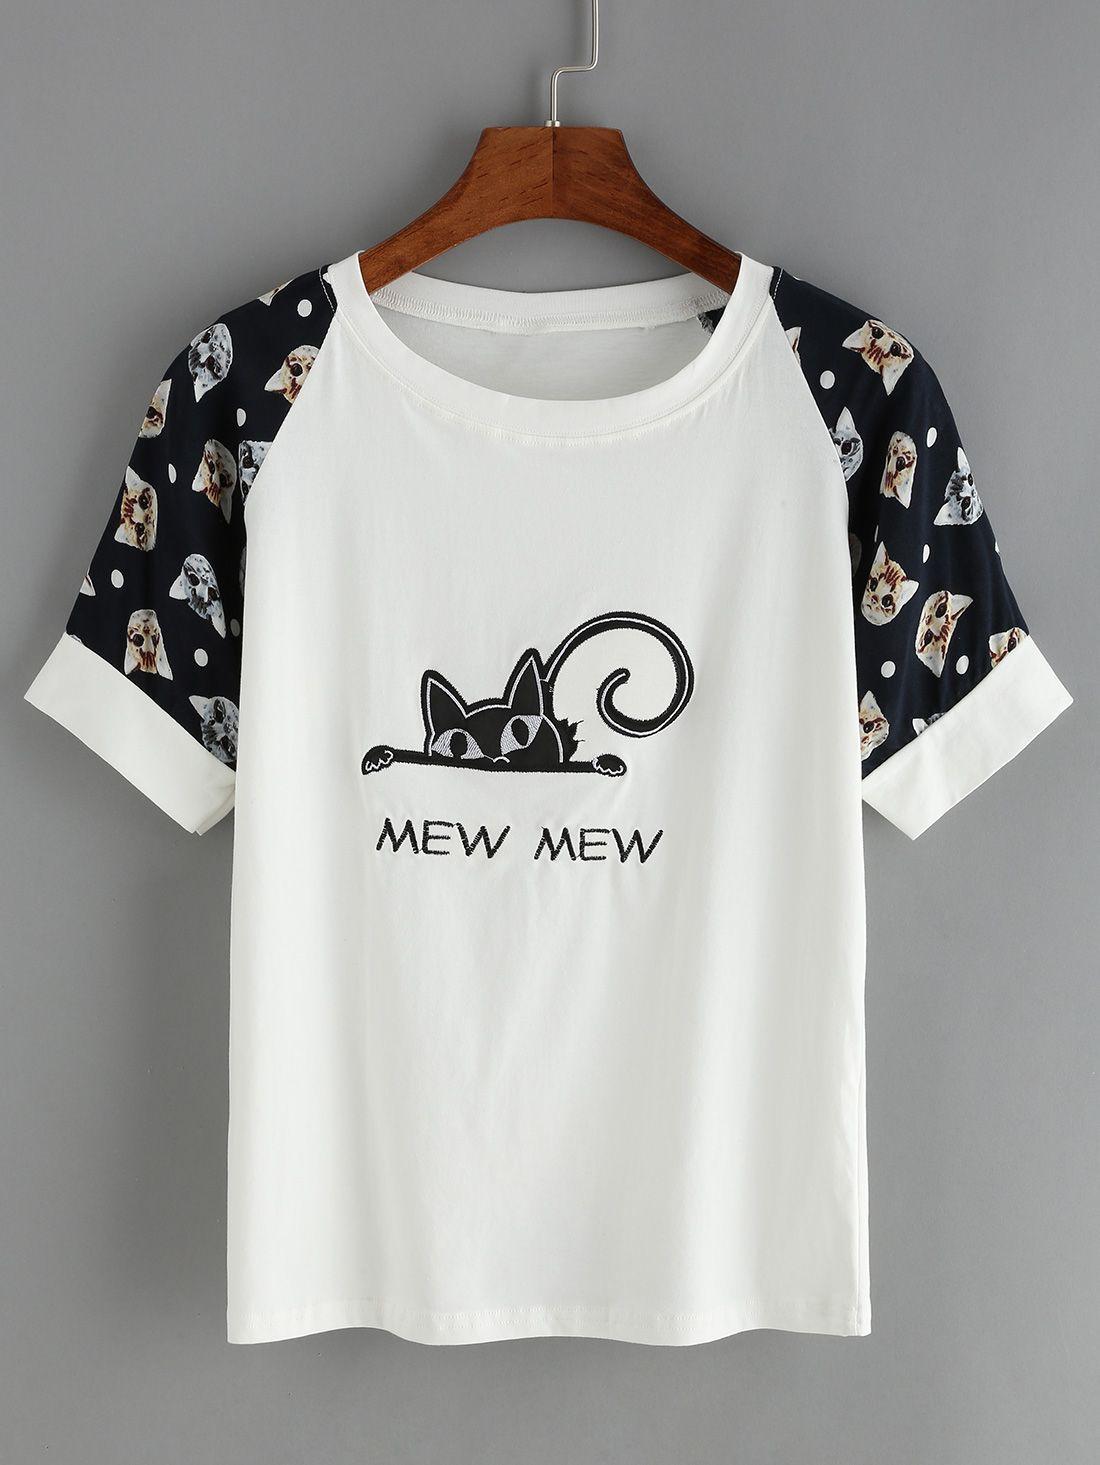 a08bc80649 Camiseta+cuello+redondo+manga+corta+bordada+gato+8.33 Más